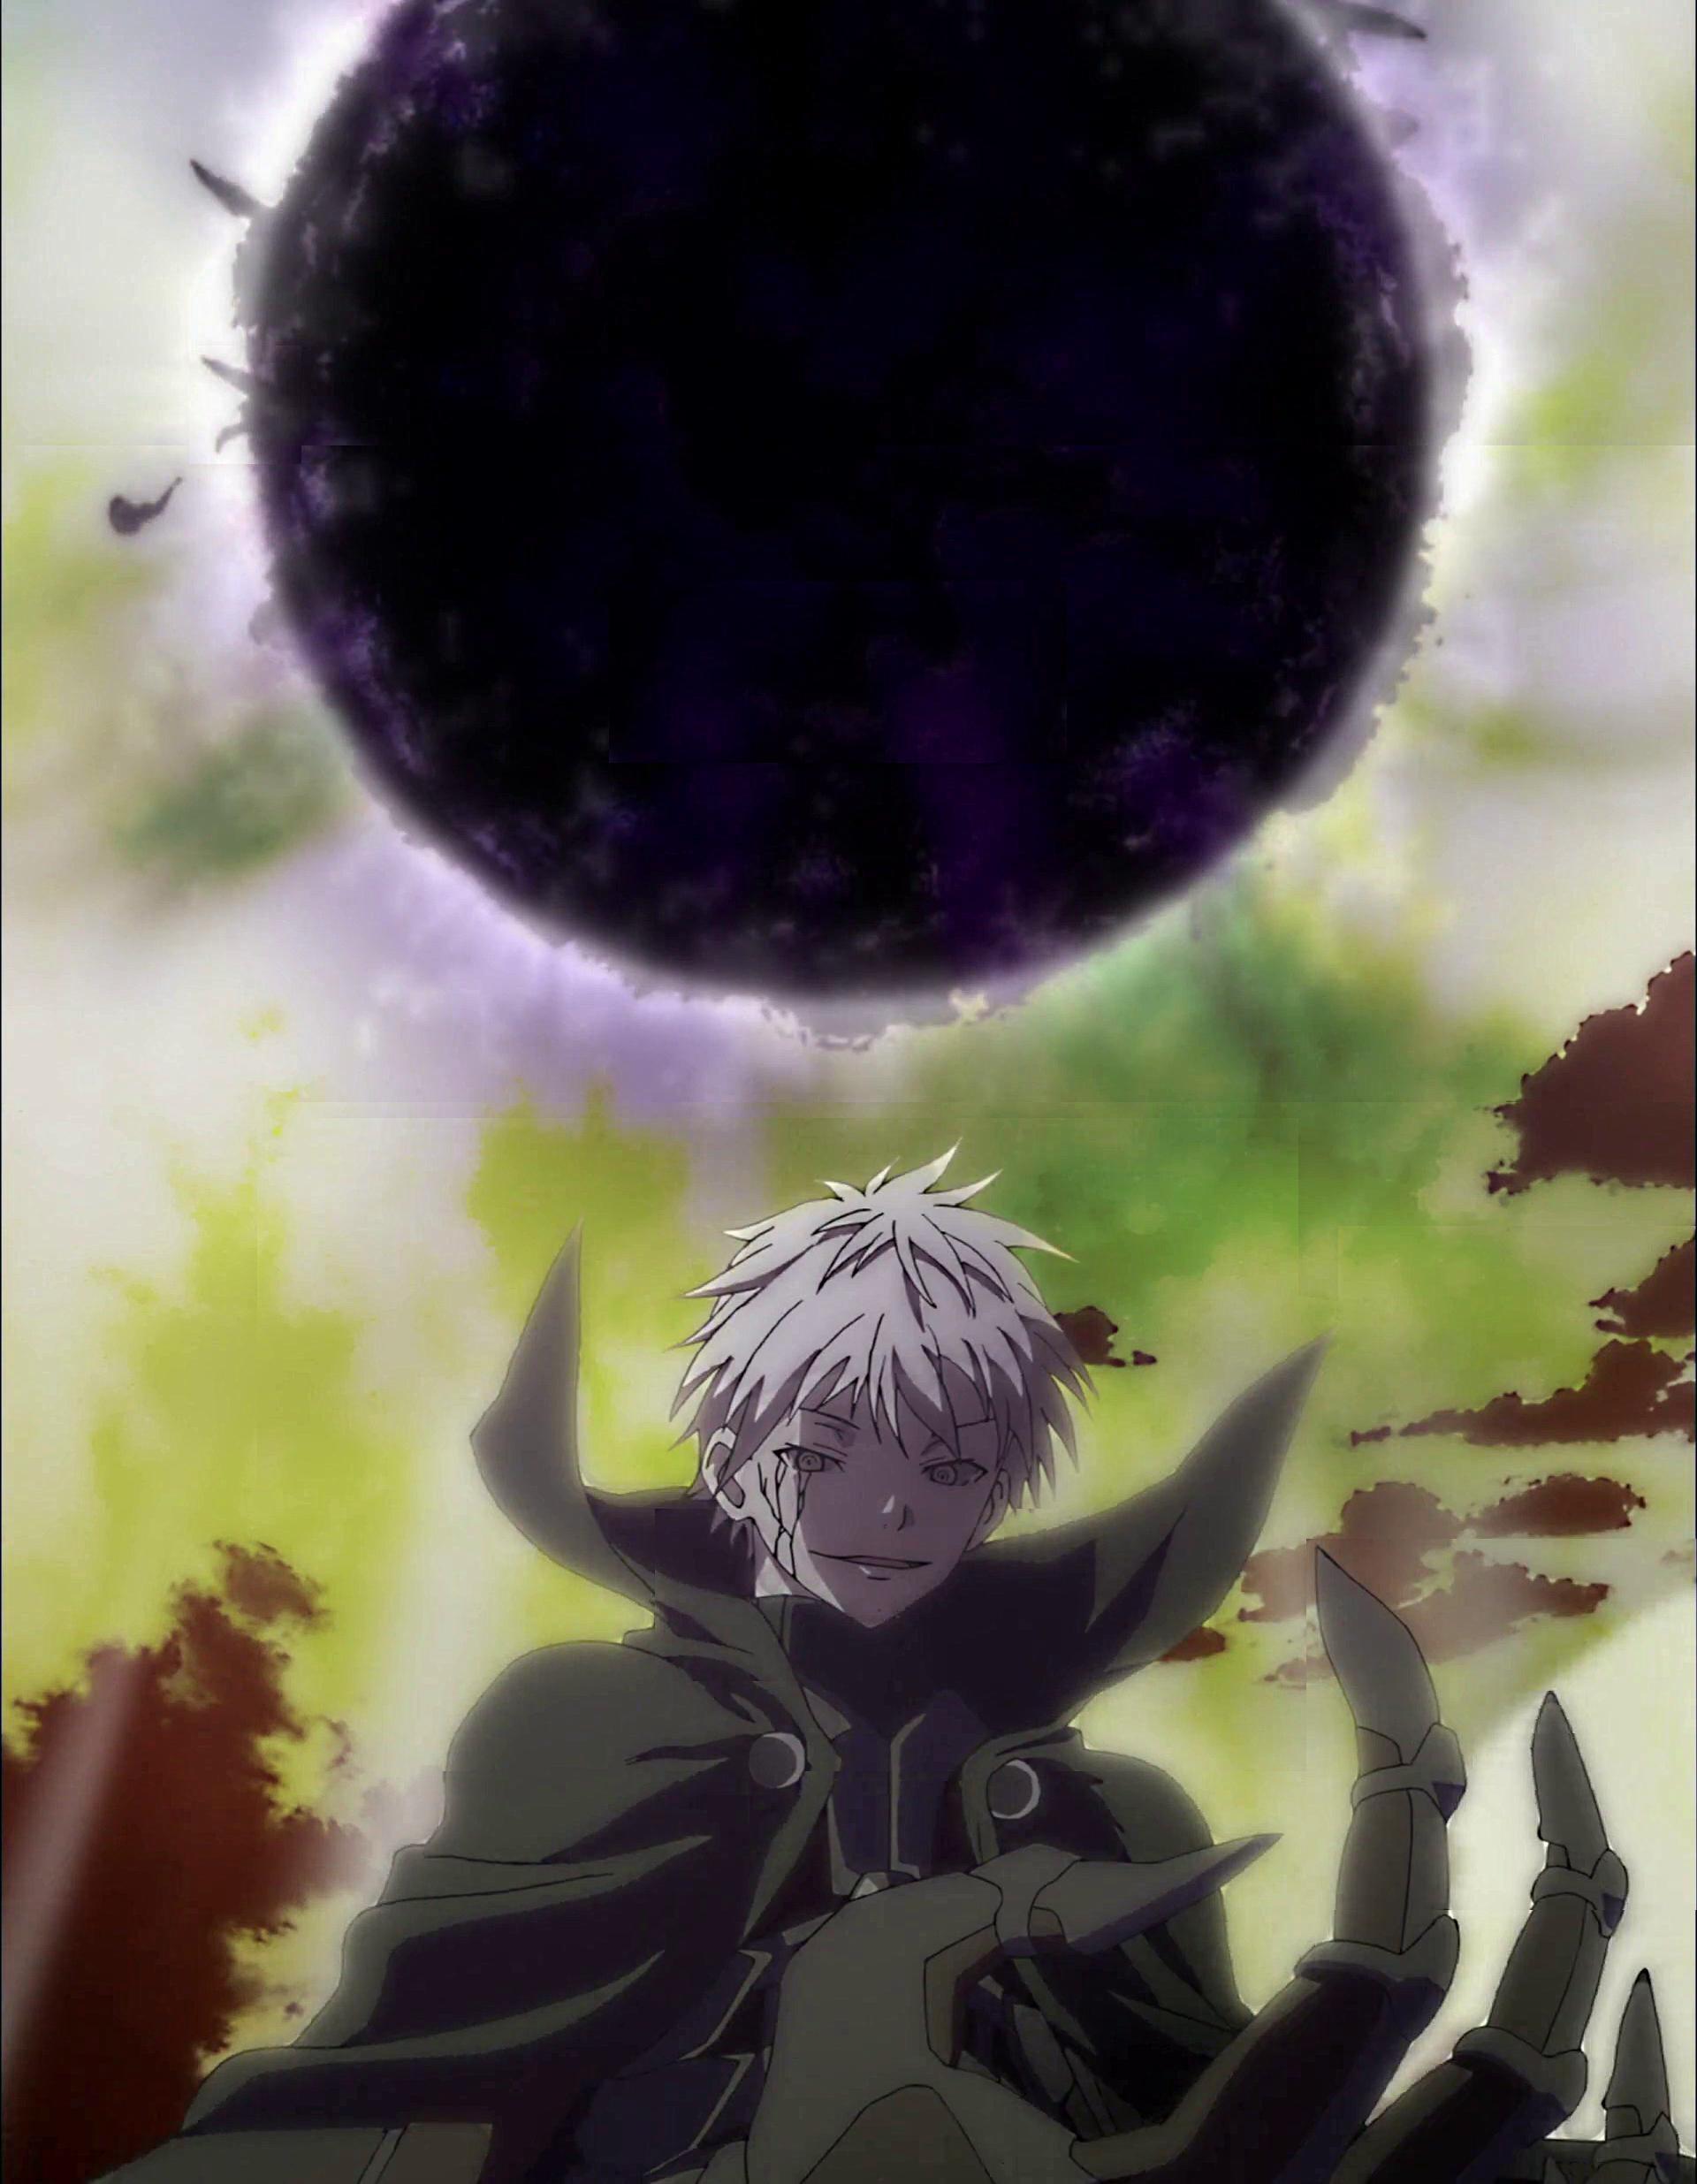 Trinity Seven wallpaper: Arata's black sun from intro edit w/ 2 sharpened  versions : anime